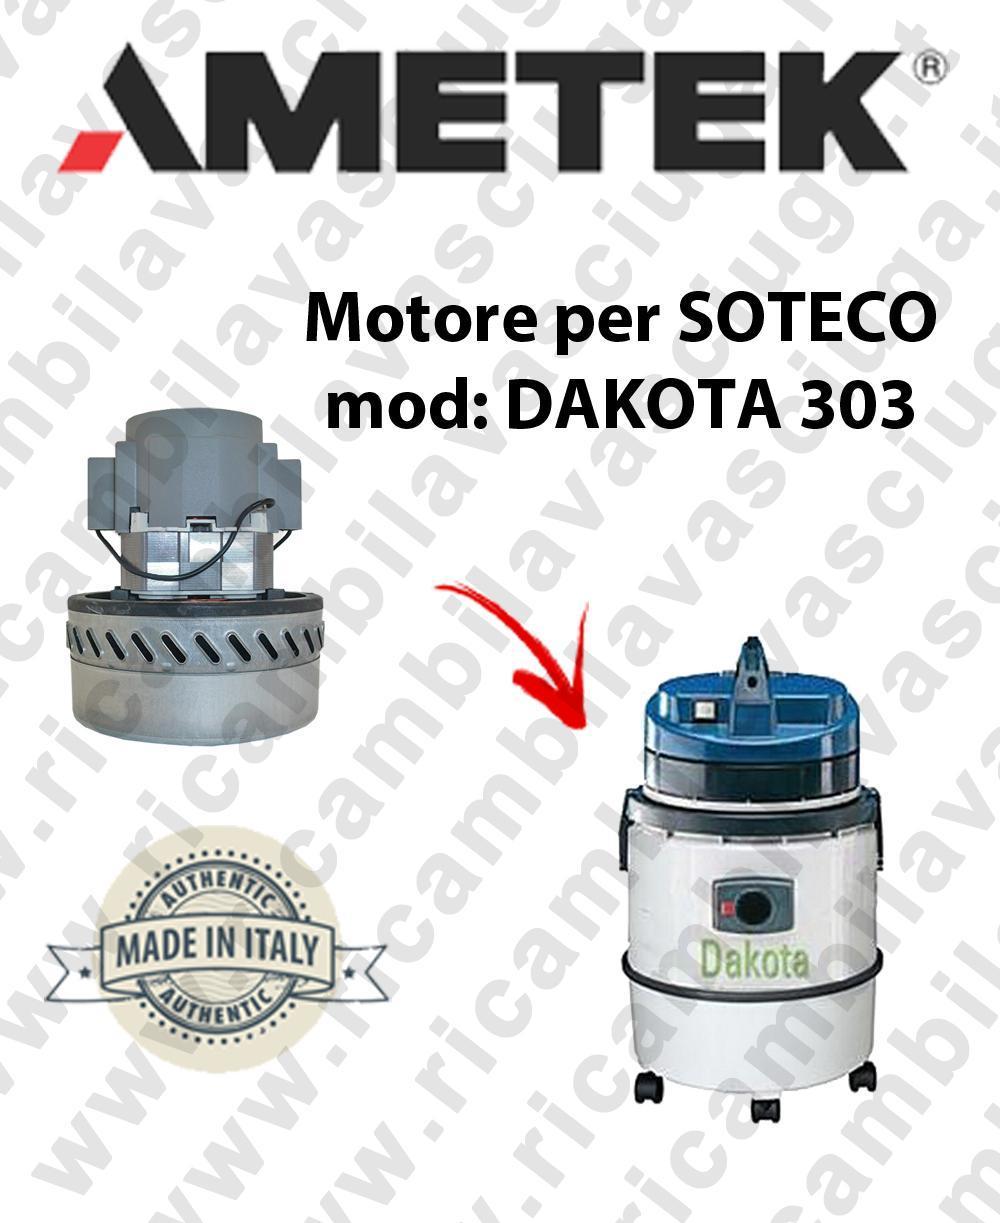 DAKOTA 303 Saugmotor AMETEK für Staubsauger SOTECO